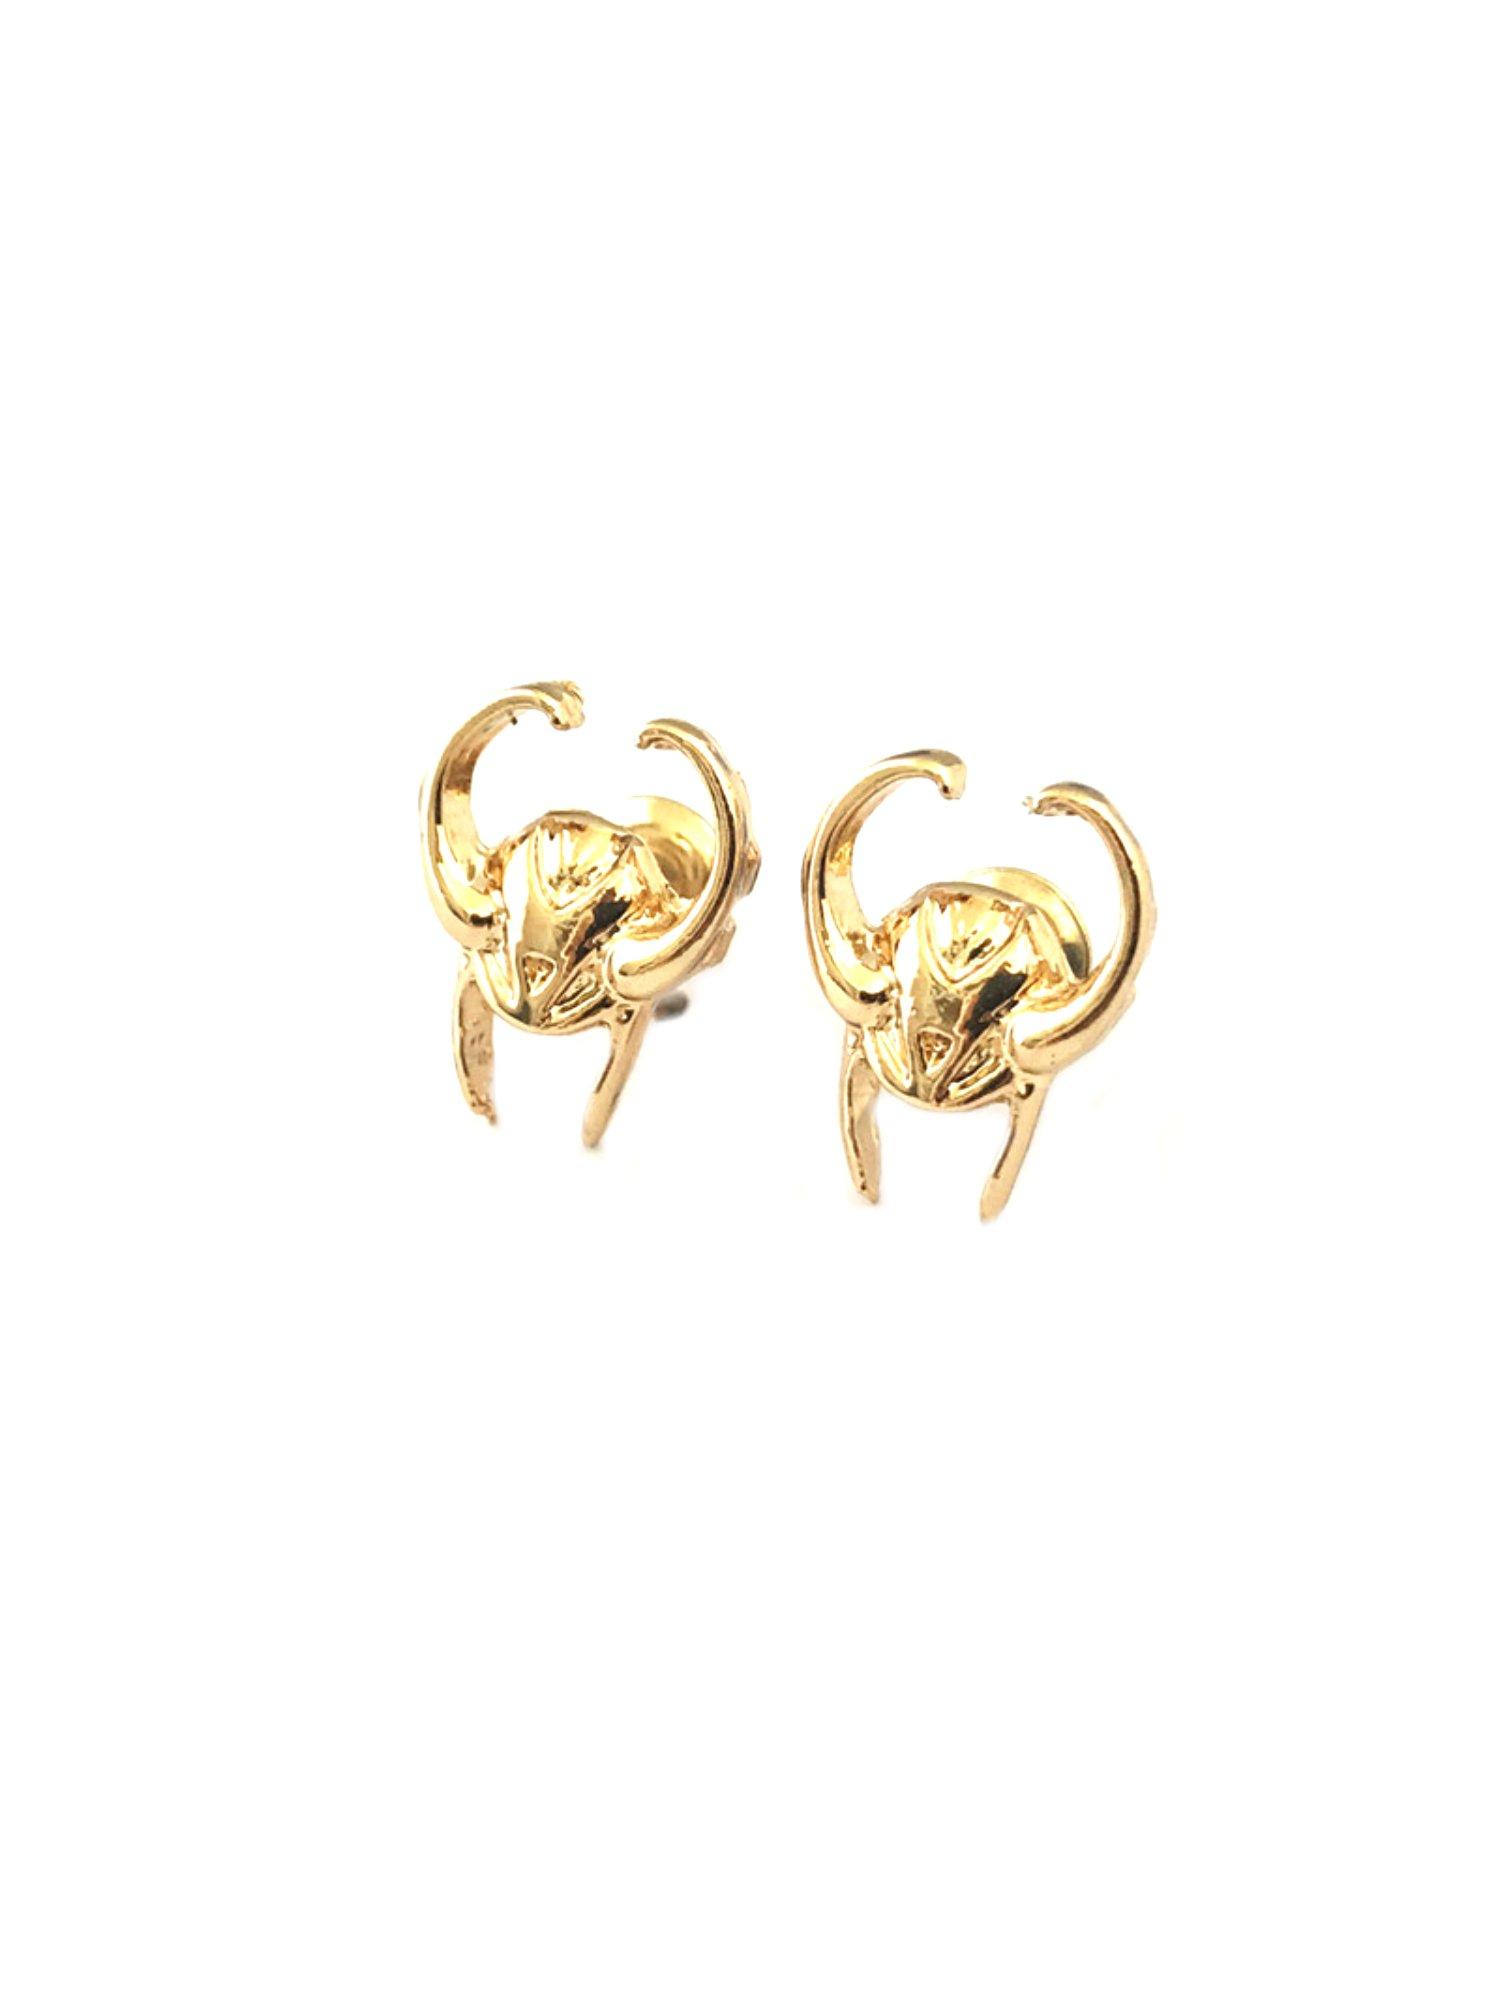 Loki Post Stud Earrings Marvel Comics 2018 Movies Avengers Infinity War Cartoon Superhero Logo Theme Premium Quality Detailed Cosplay Jewelry Gift Series